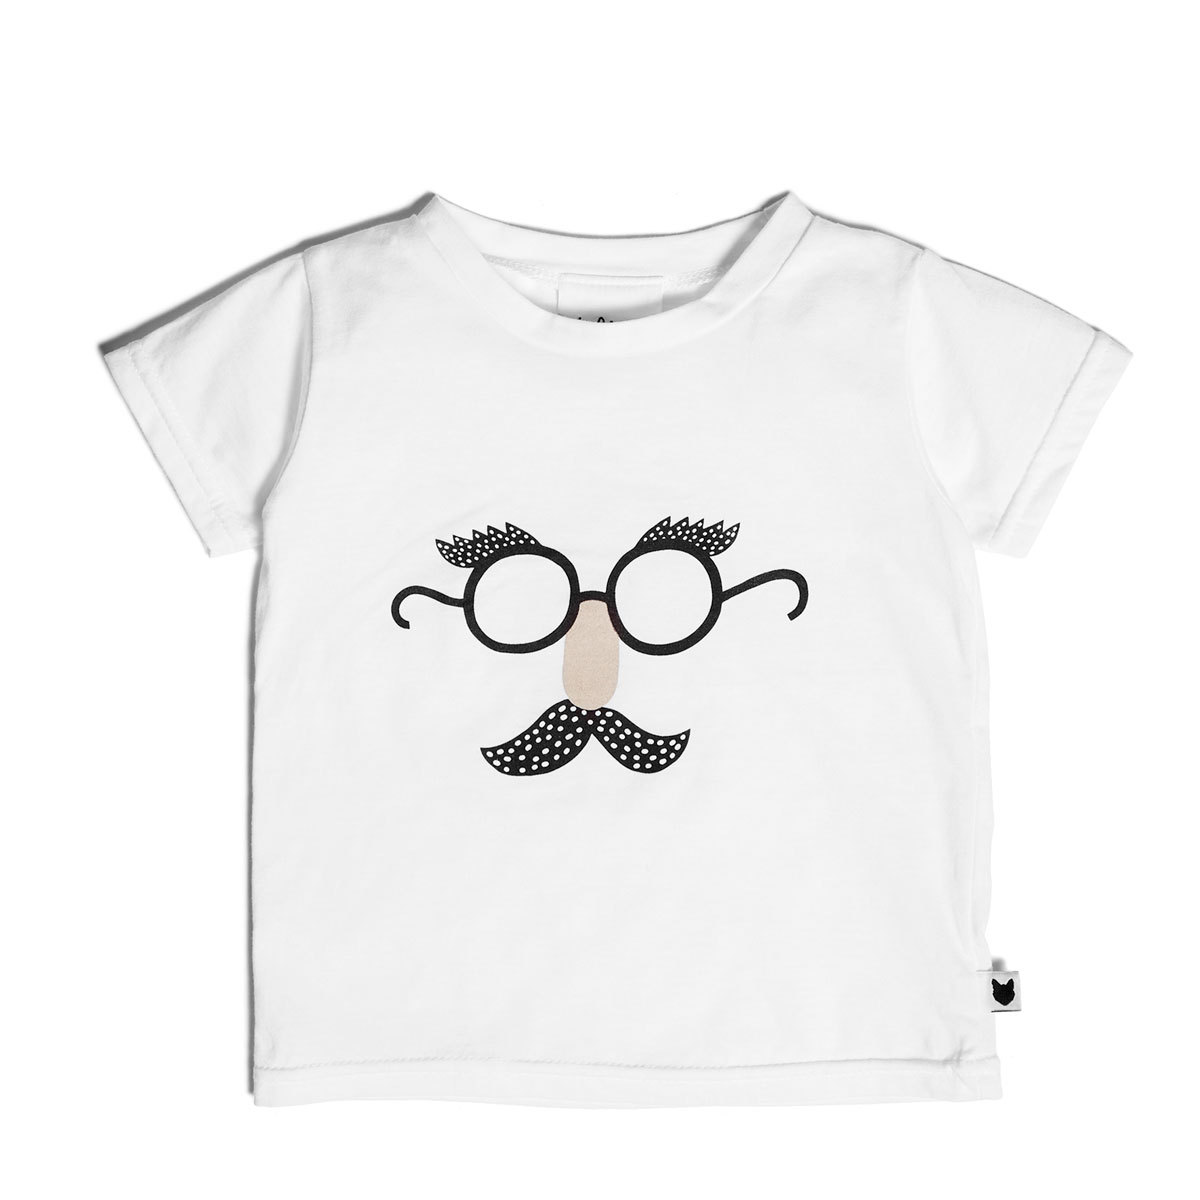 Hauts bébé Tee-Shirt Funny Face - 0/6 Mois